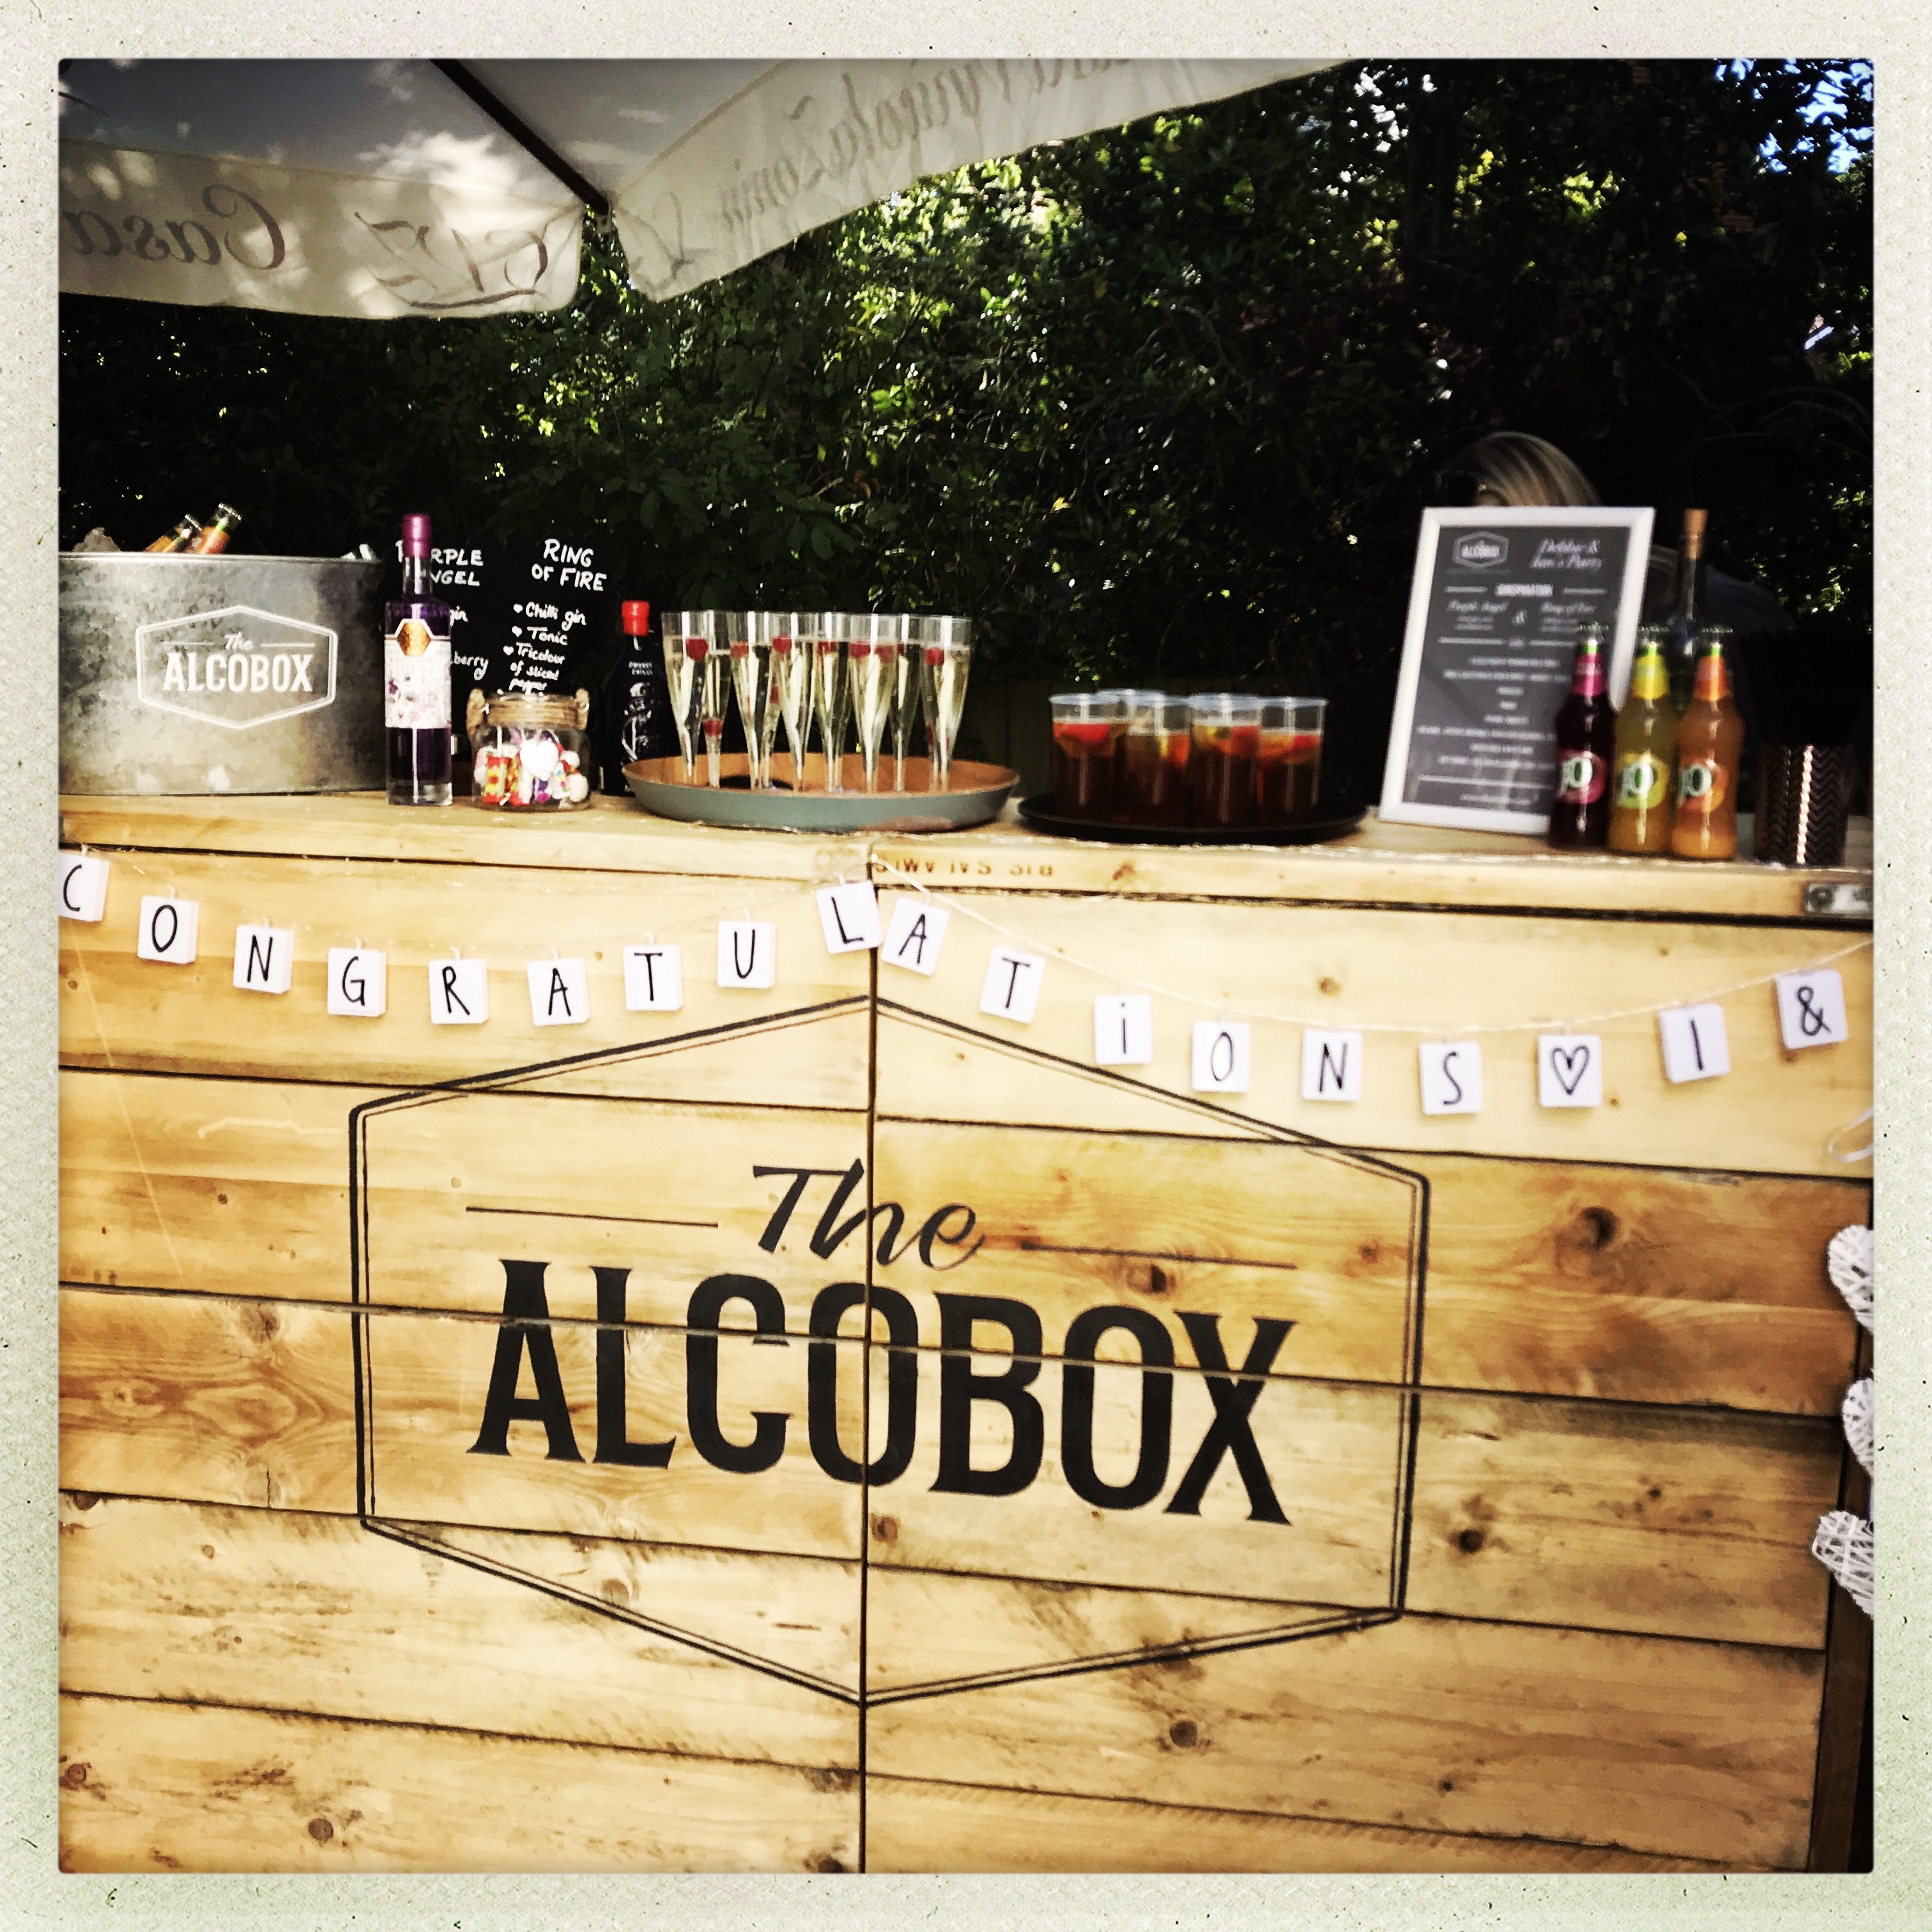 Alcobox mobile pop-bar ready for service at garden party